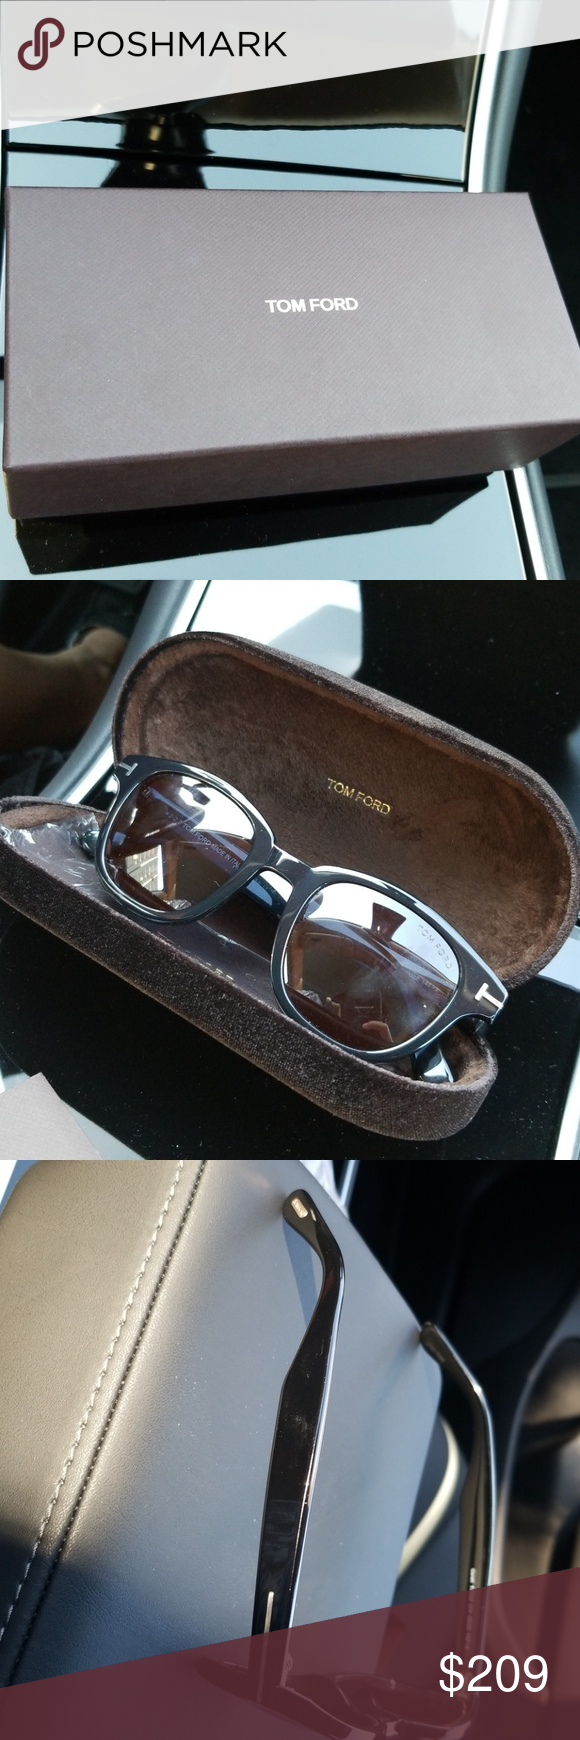 Brand New Female Round Wrap Sunglasses Women Fashion Big Frame Sun Glasses Girl Boy Eyewear Retro Travel Eye Accessory Cute Be Shrewd In Money Matters Girl's Sunglasses